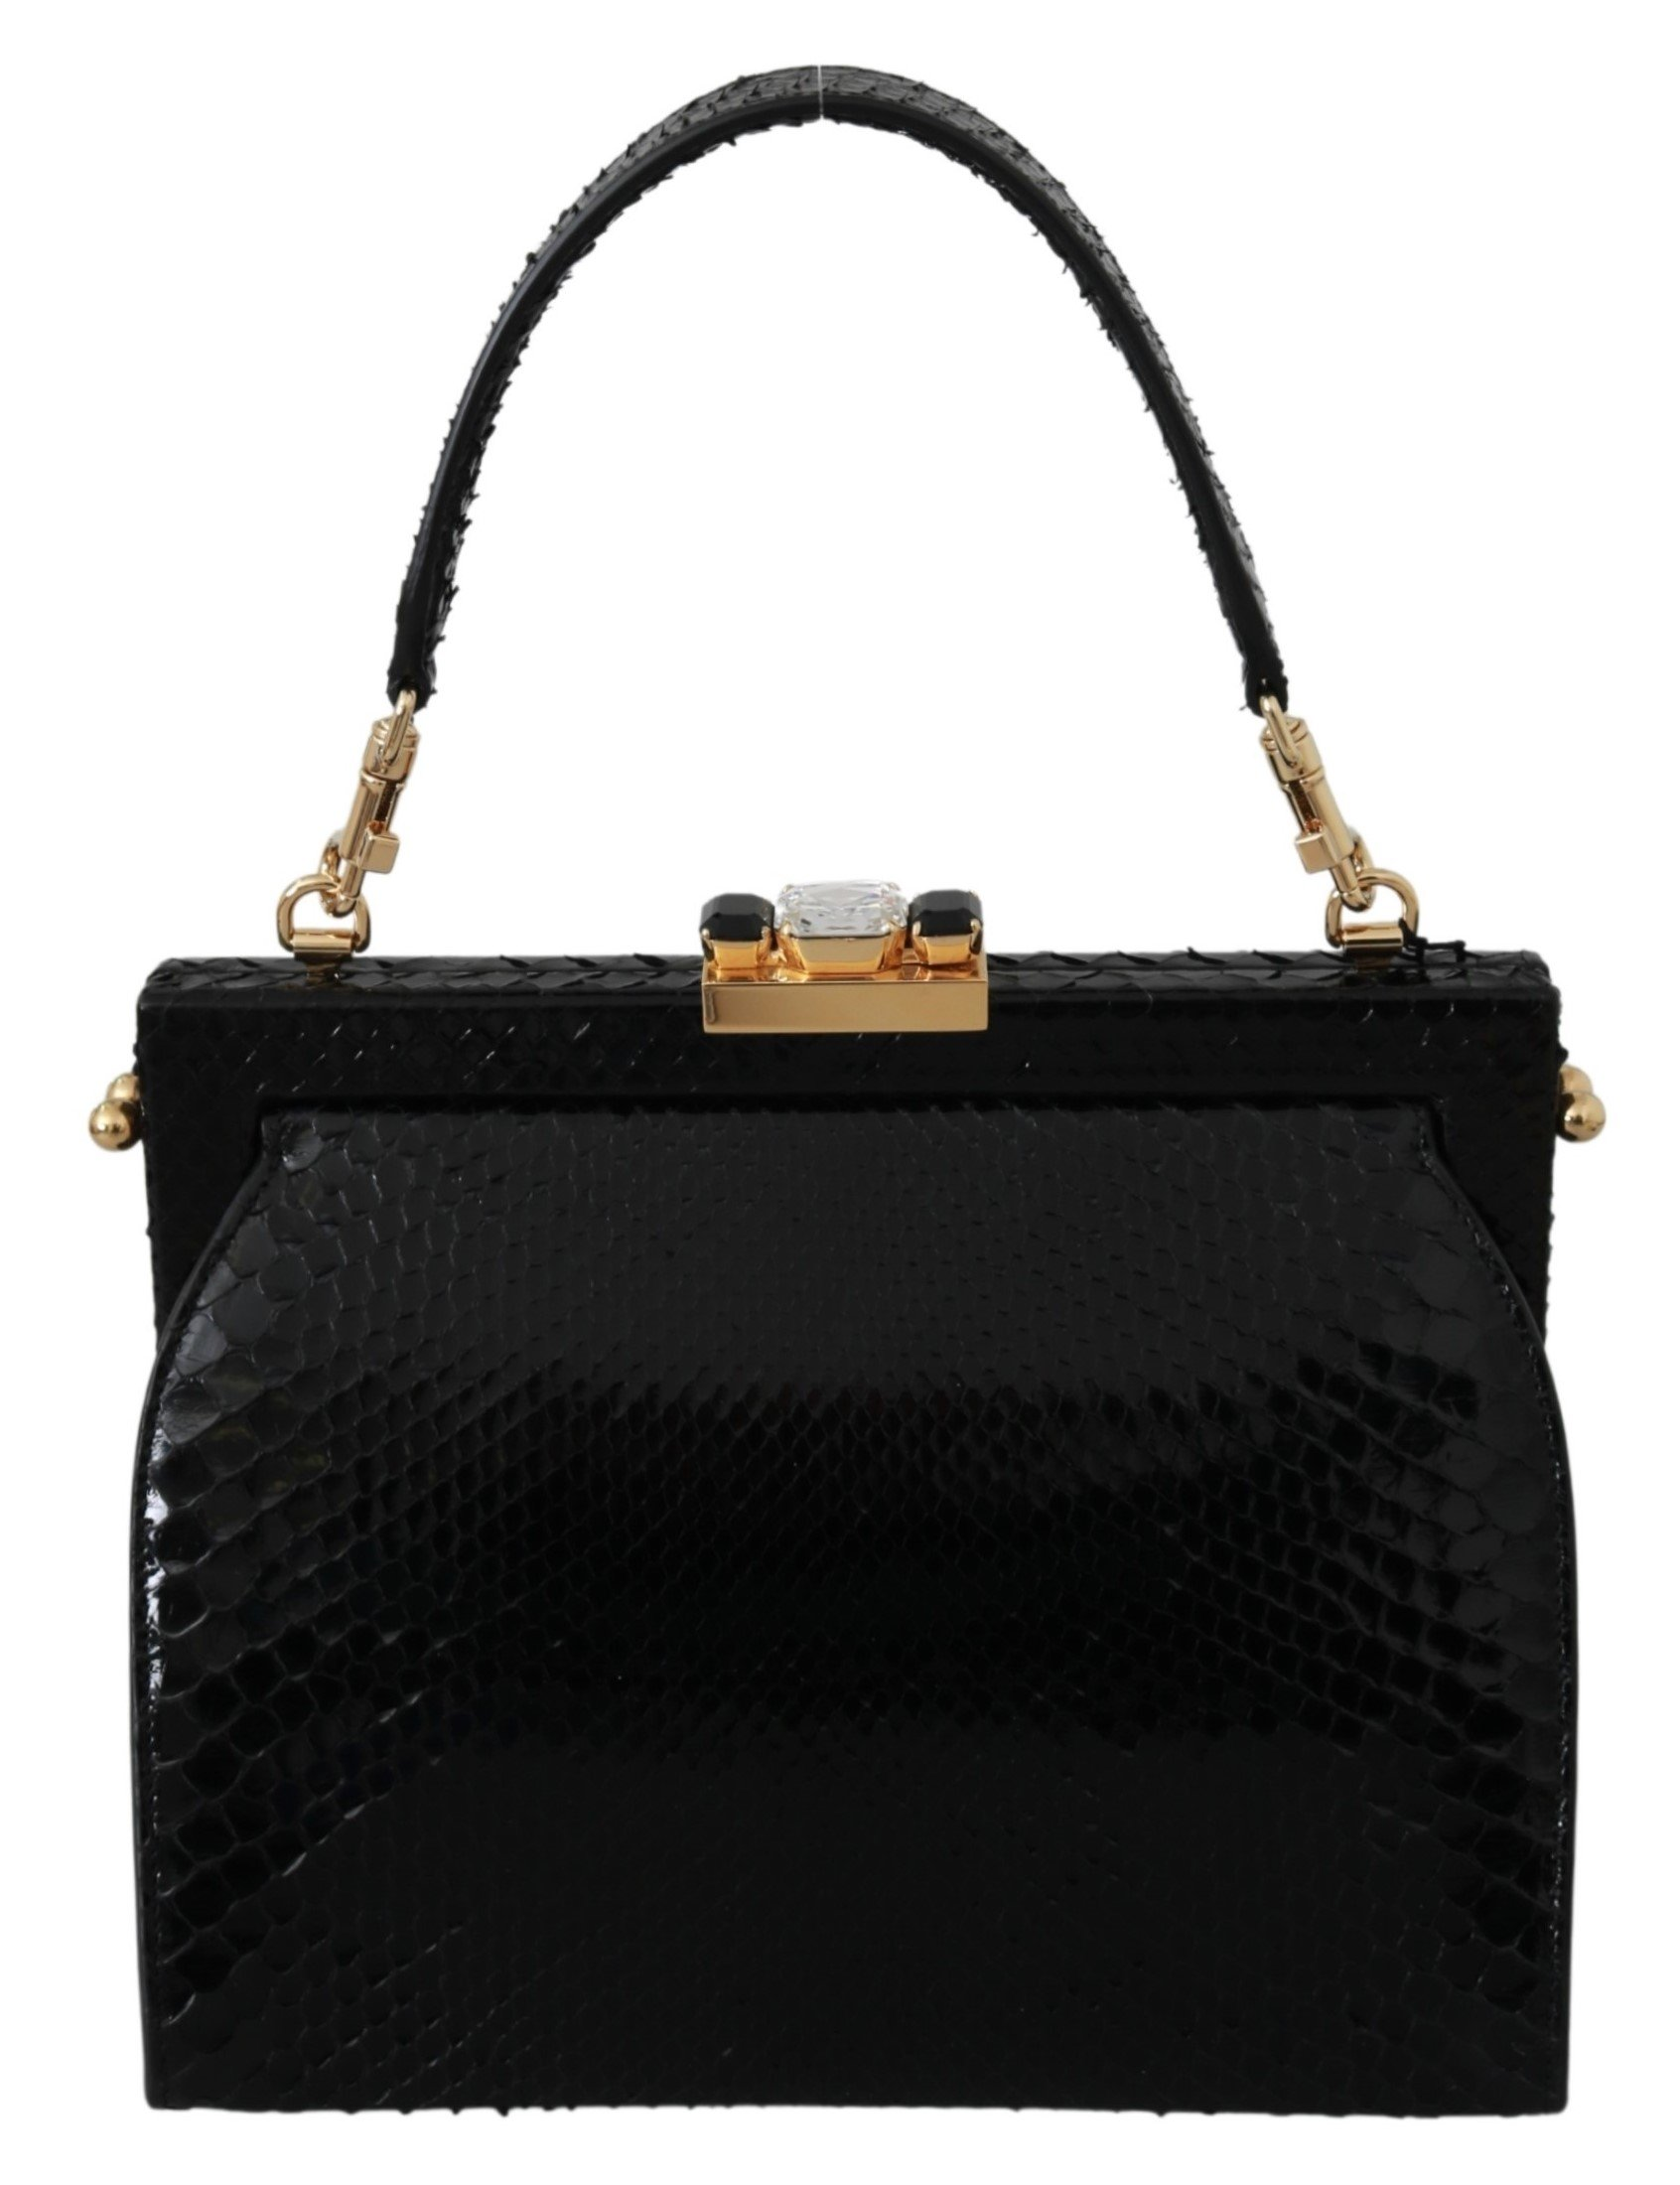 Dolce & Gabbana Women's Crystal Studs Python ADELINA Purse Black VAS9417